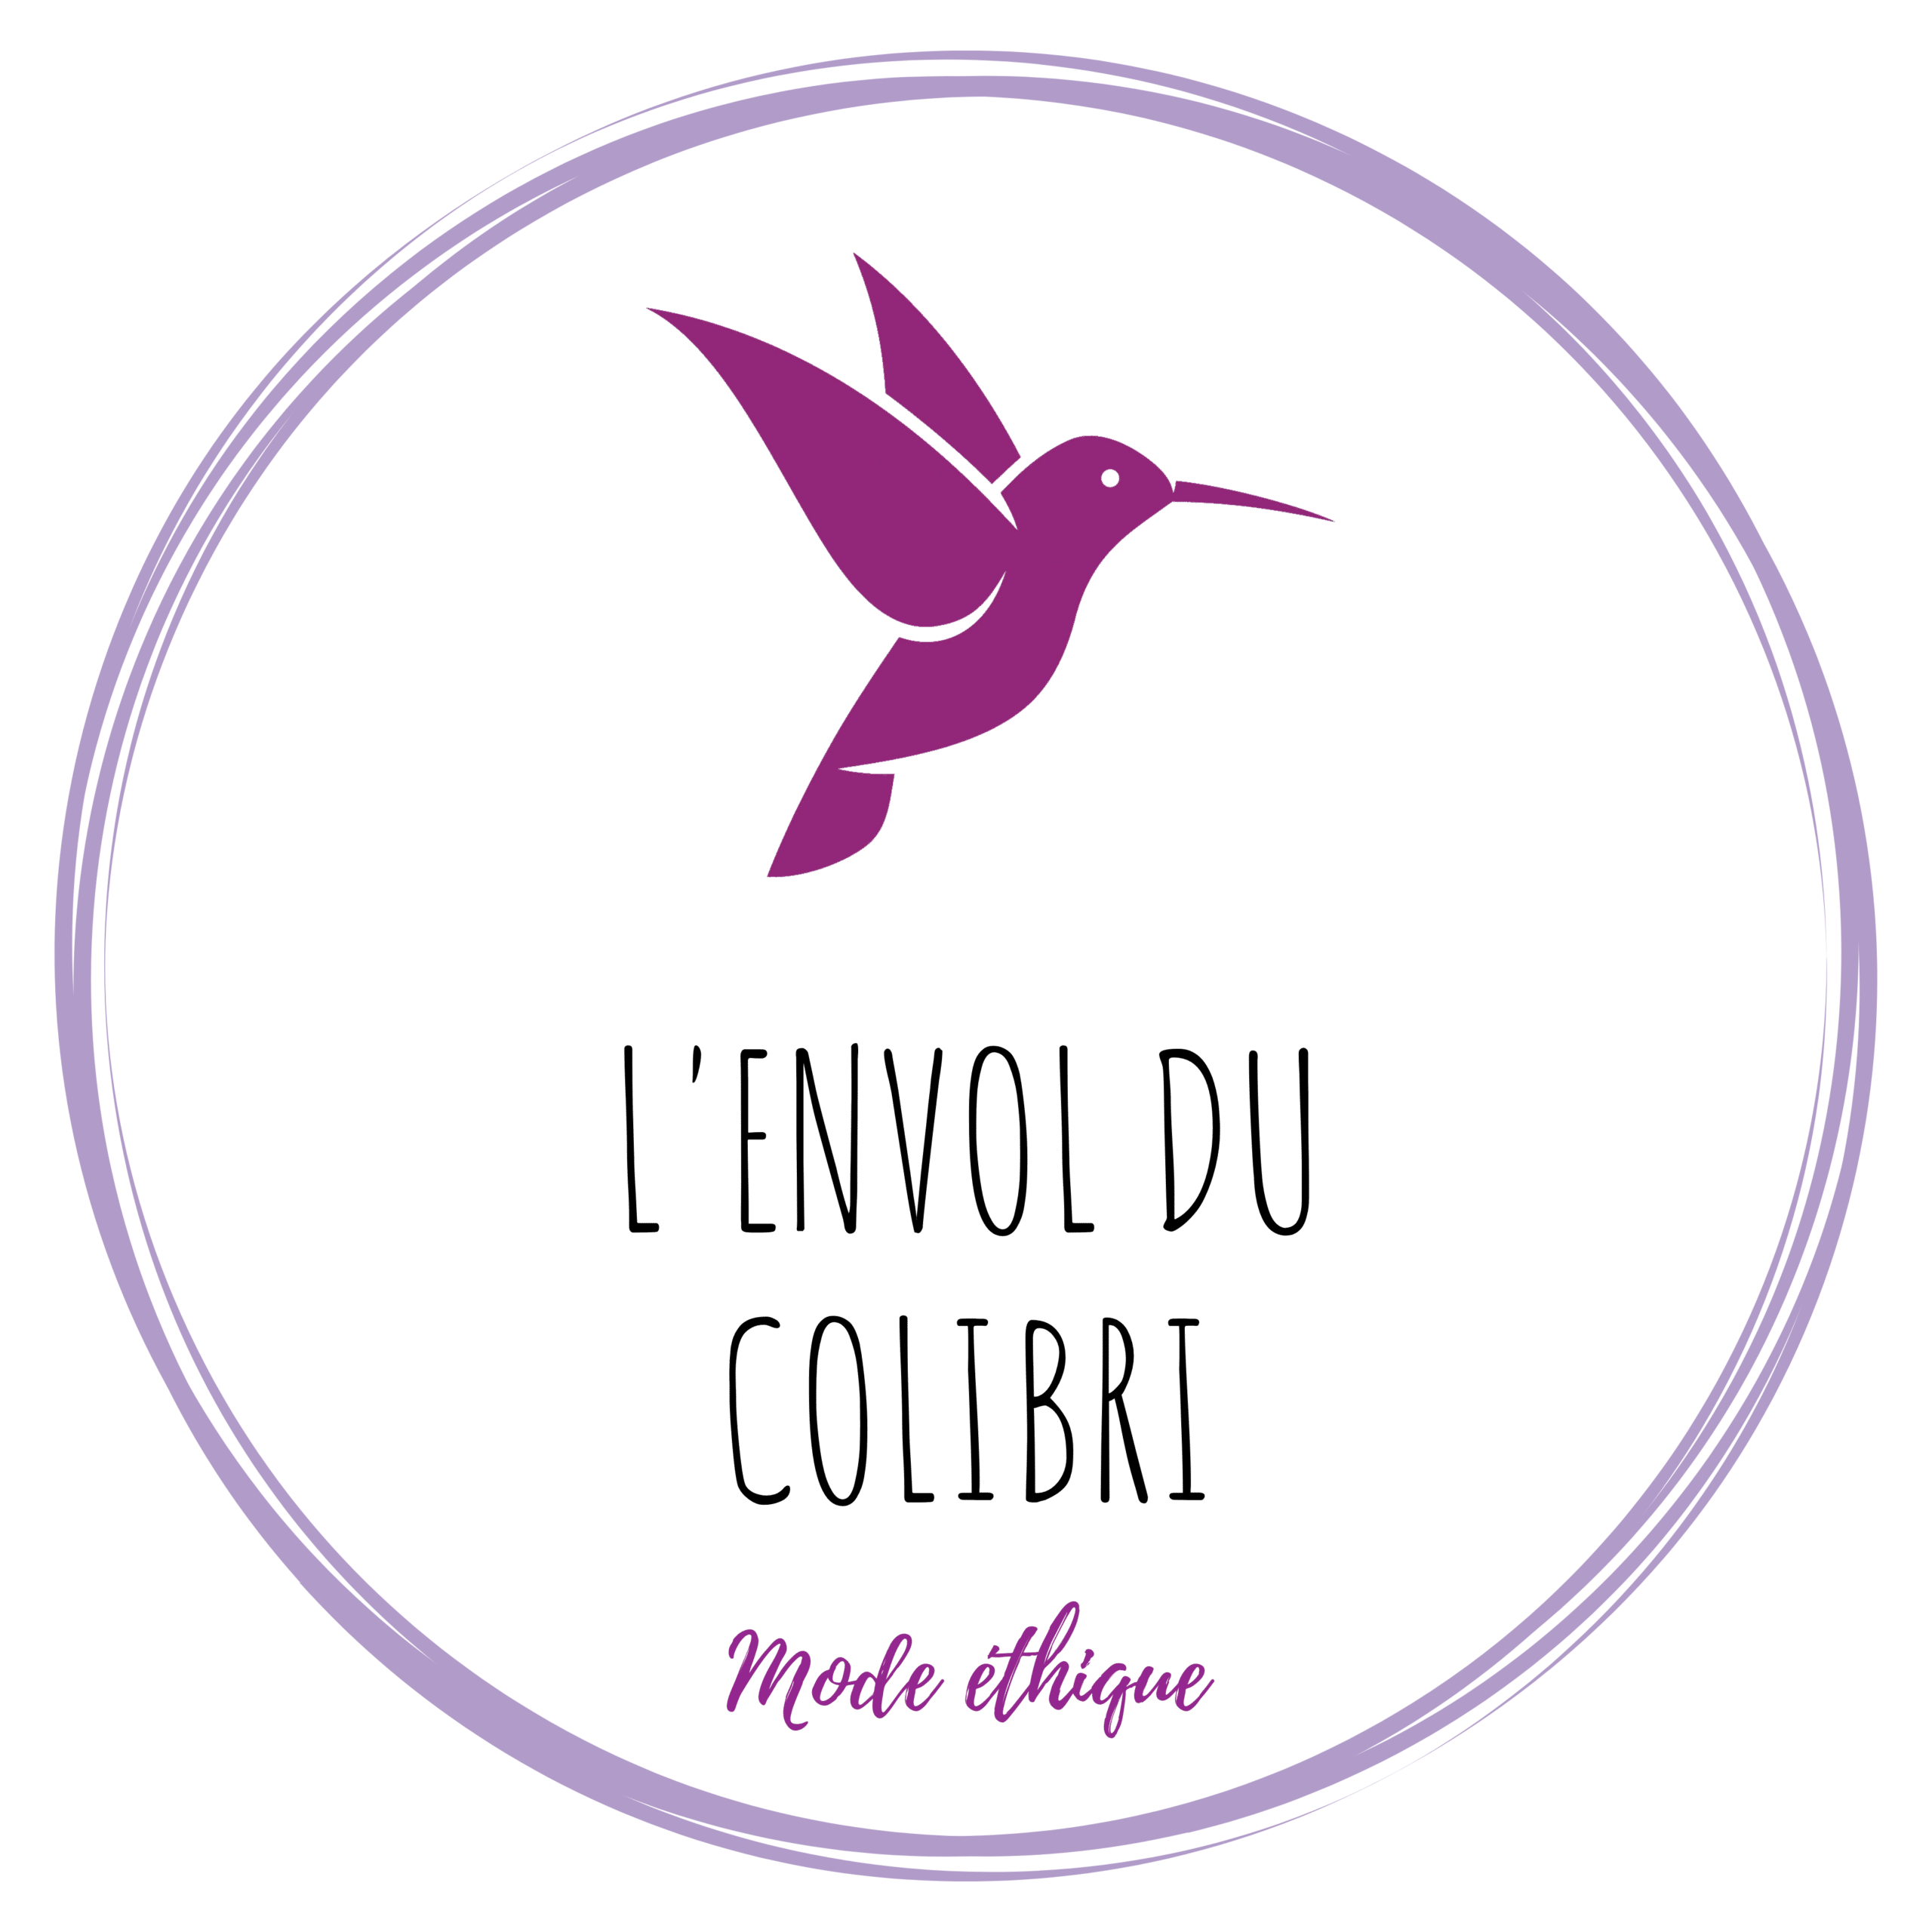 L'Envol du Colibri Organic, ethical and fair trade clothing